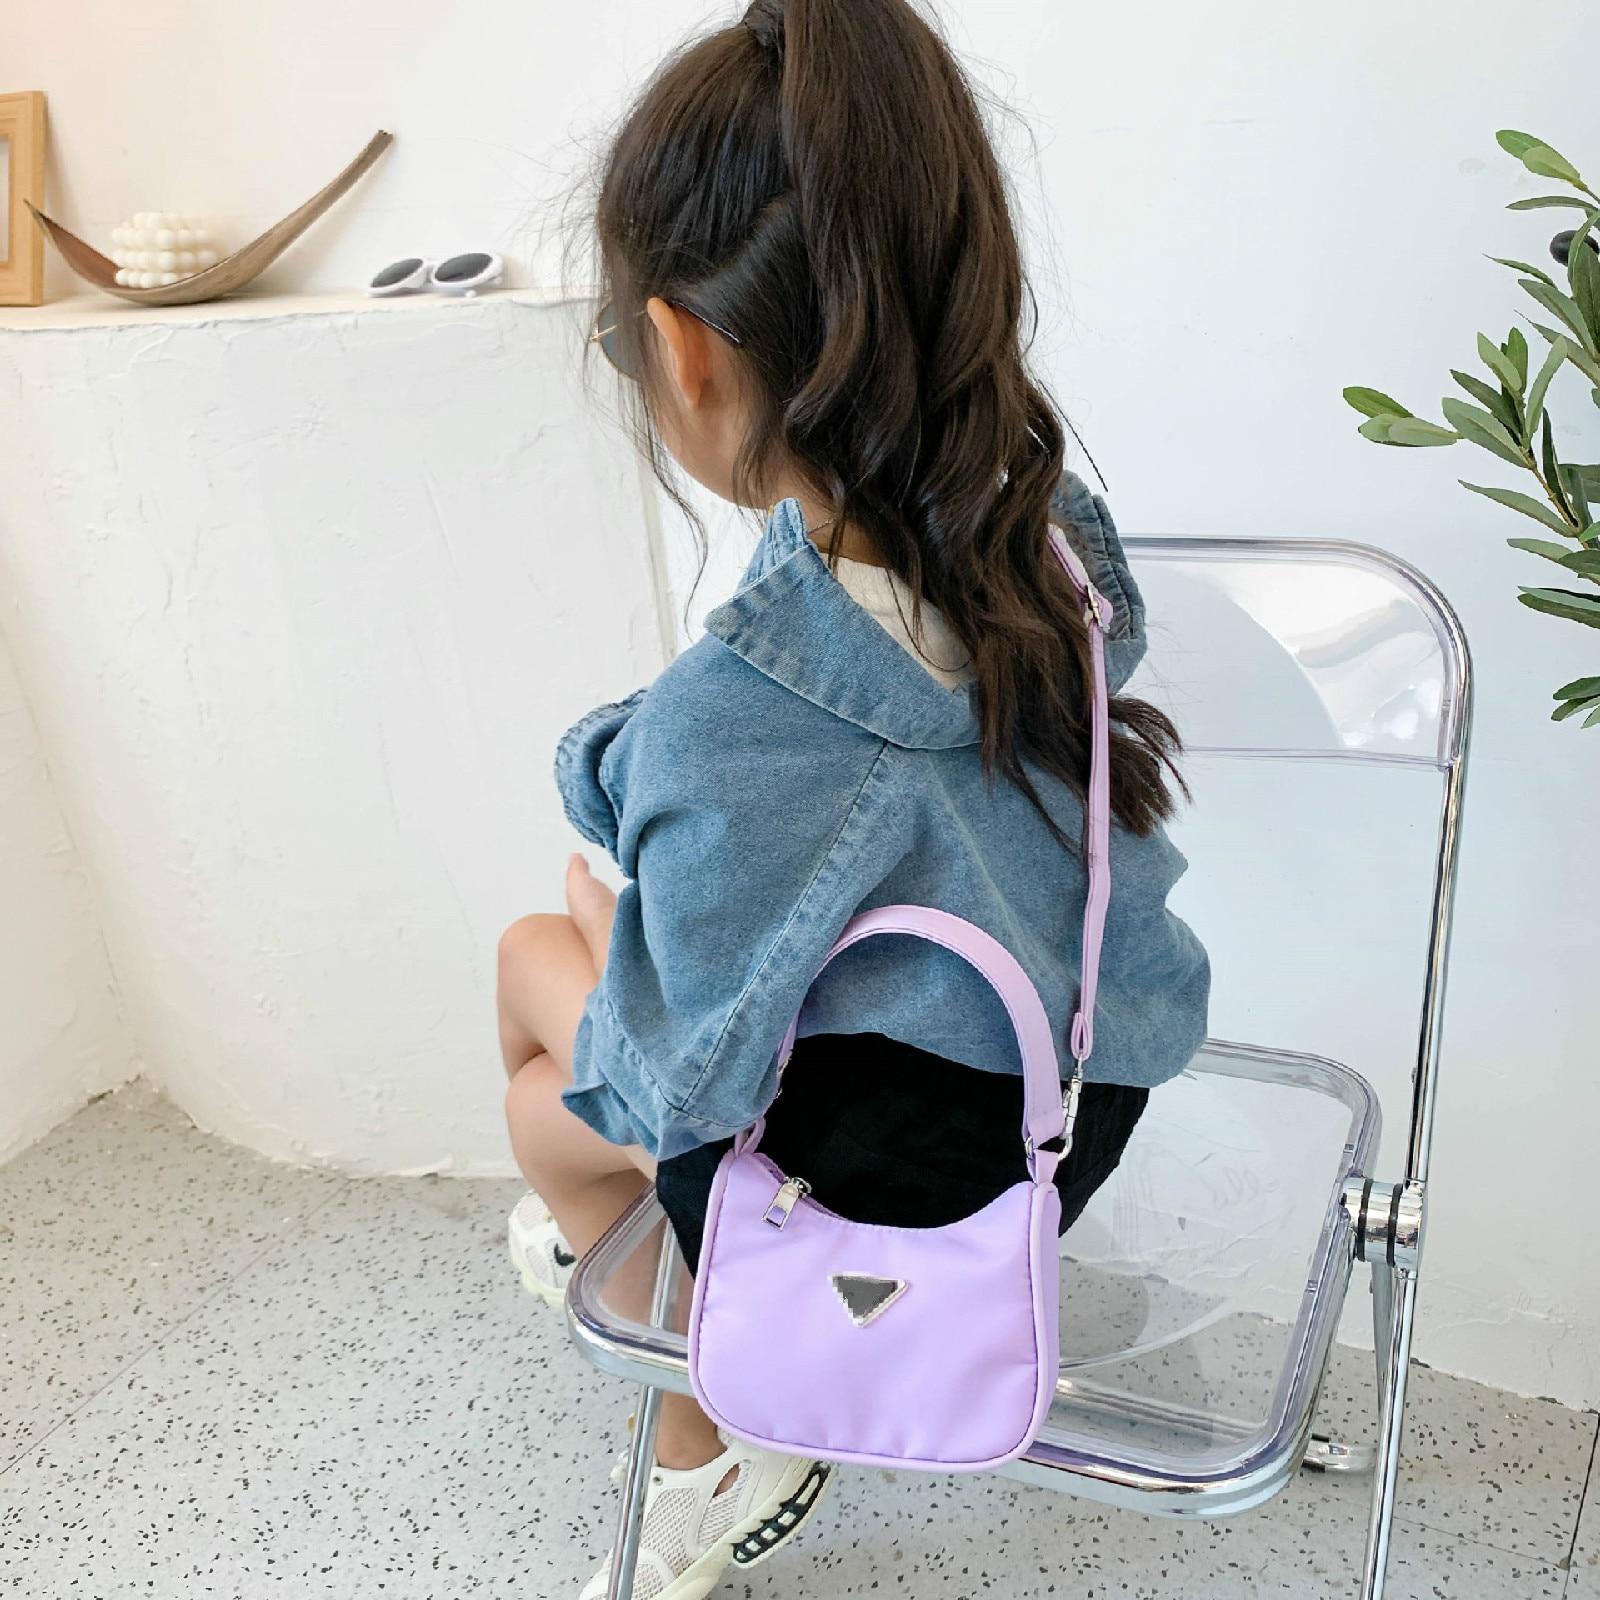 Children Crossbody Bags Girls Underarm Bags 2020 New Trend Baby One-shoulder Messenger Fashion Handbag